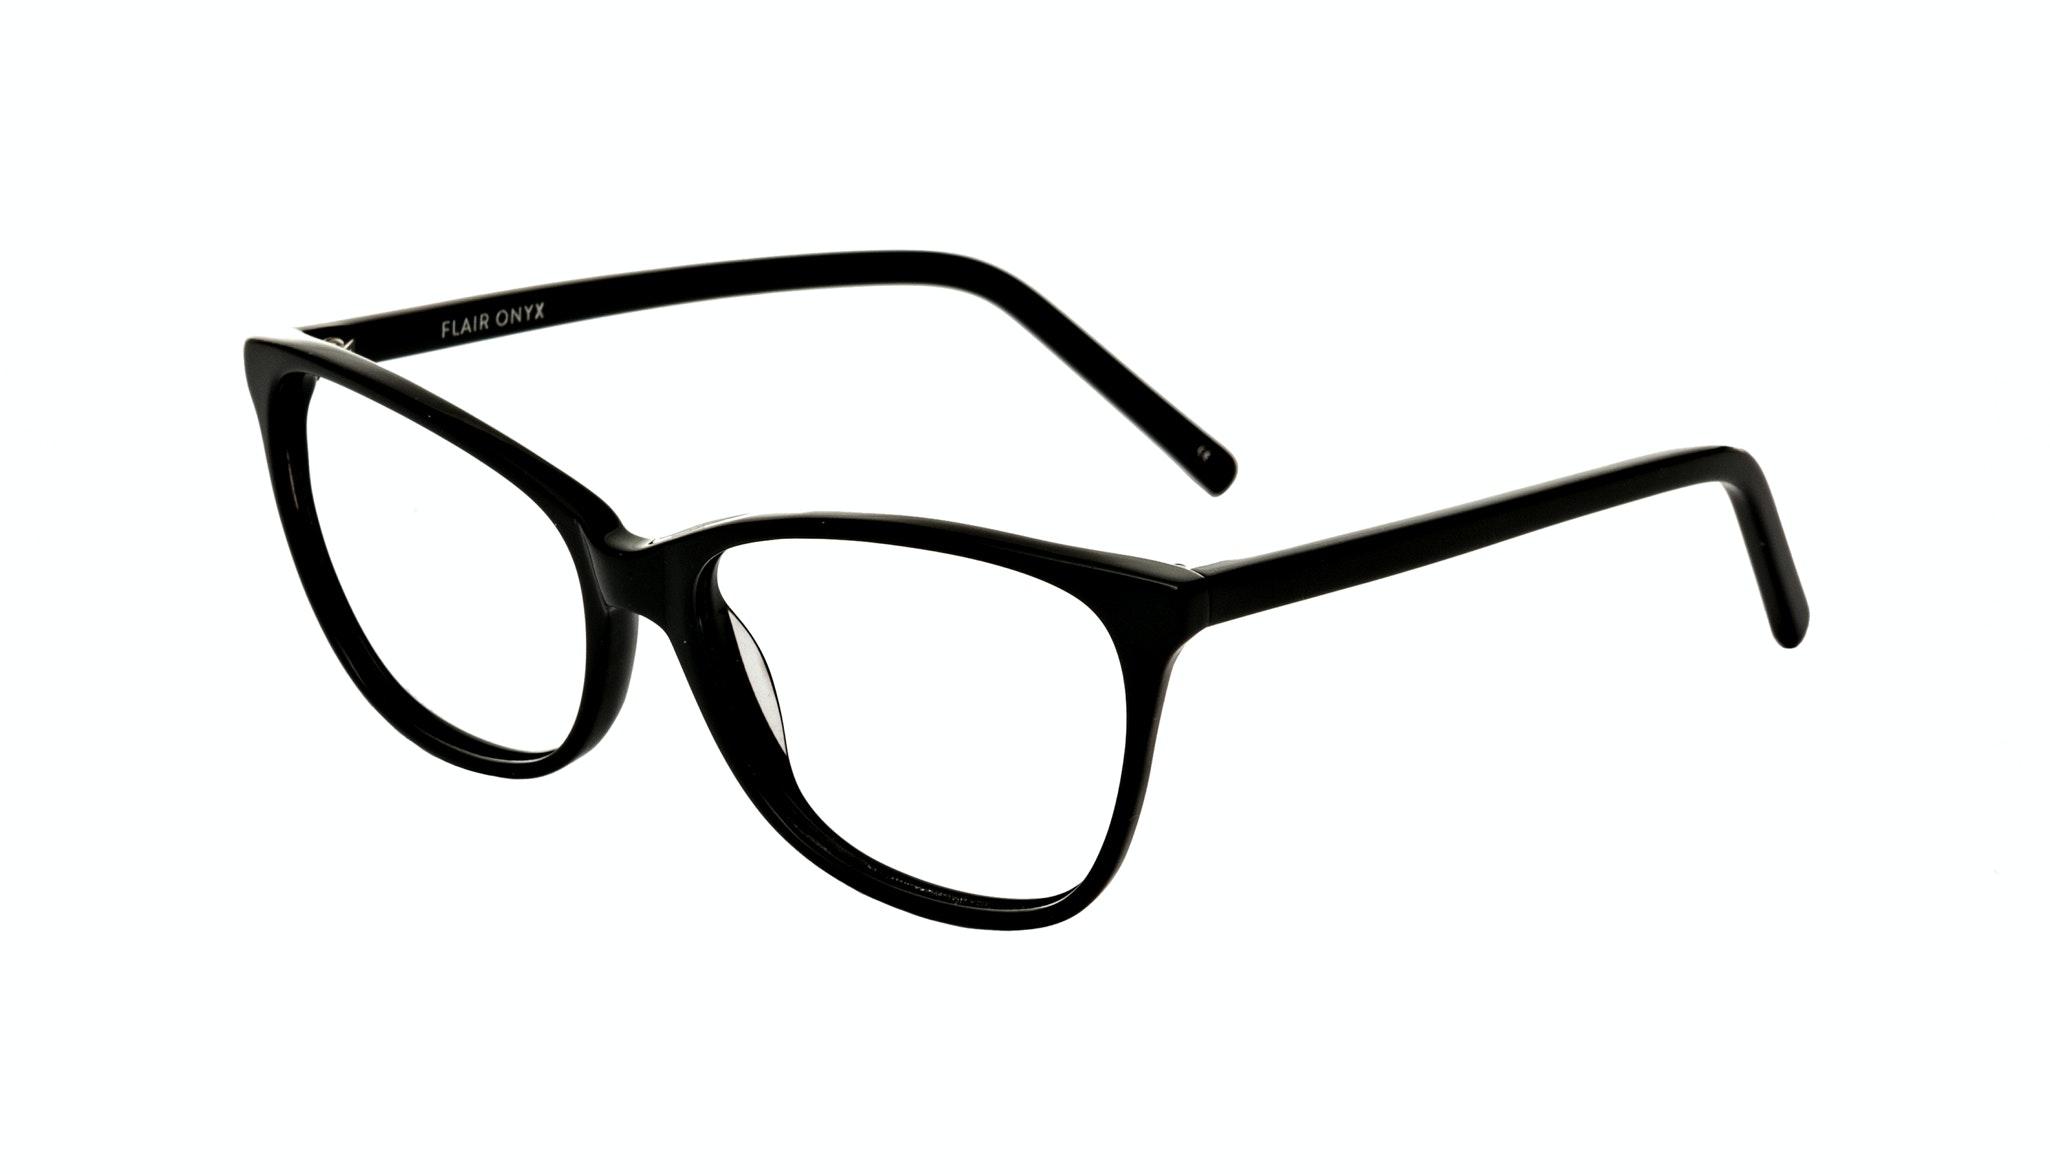 Affordable Fashion Glasses Cat Eye Rectangle Eyeglasses Women Flair Onyx Tilt